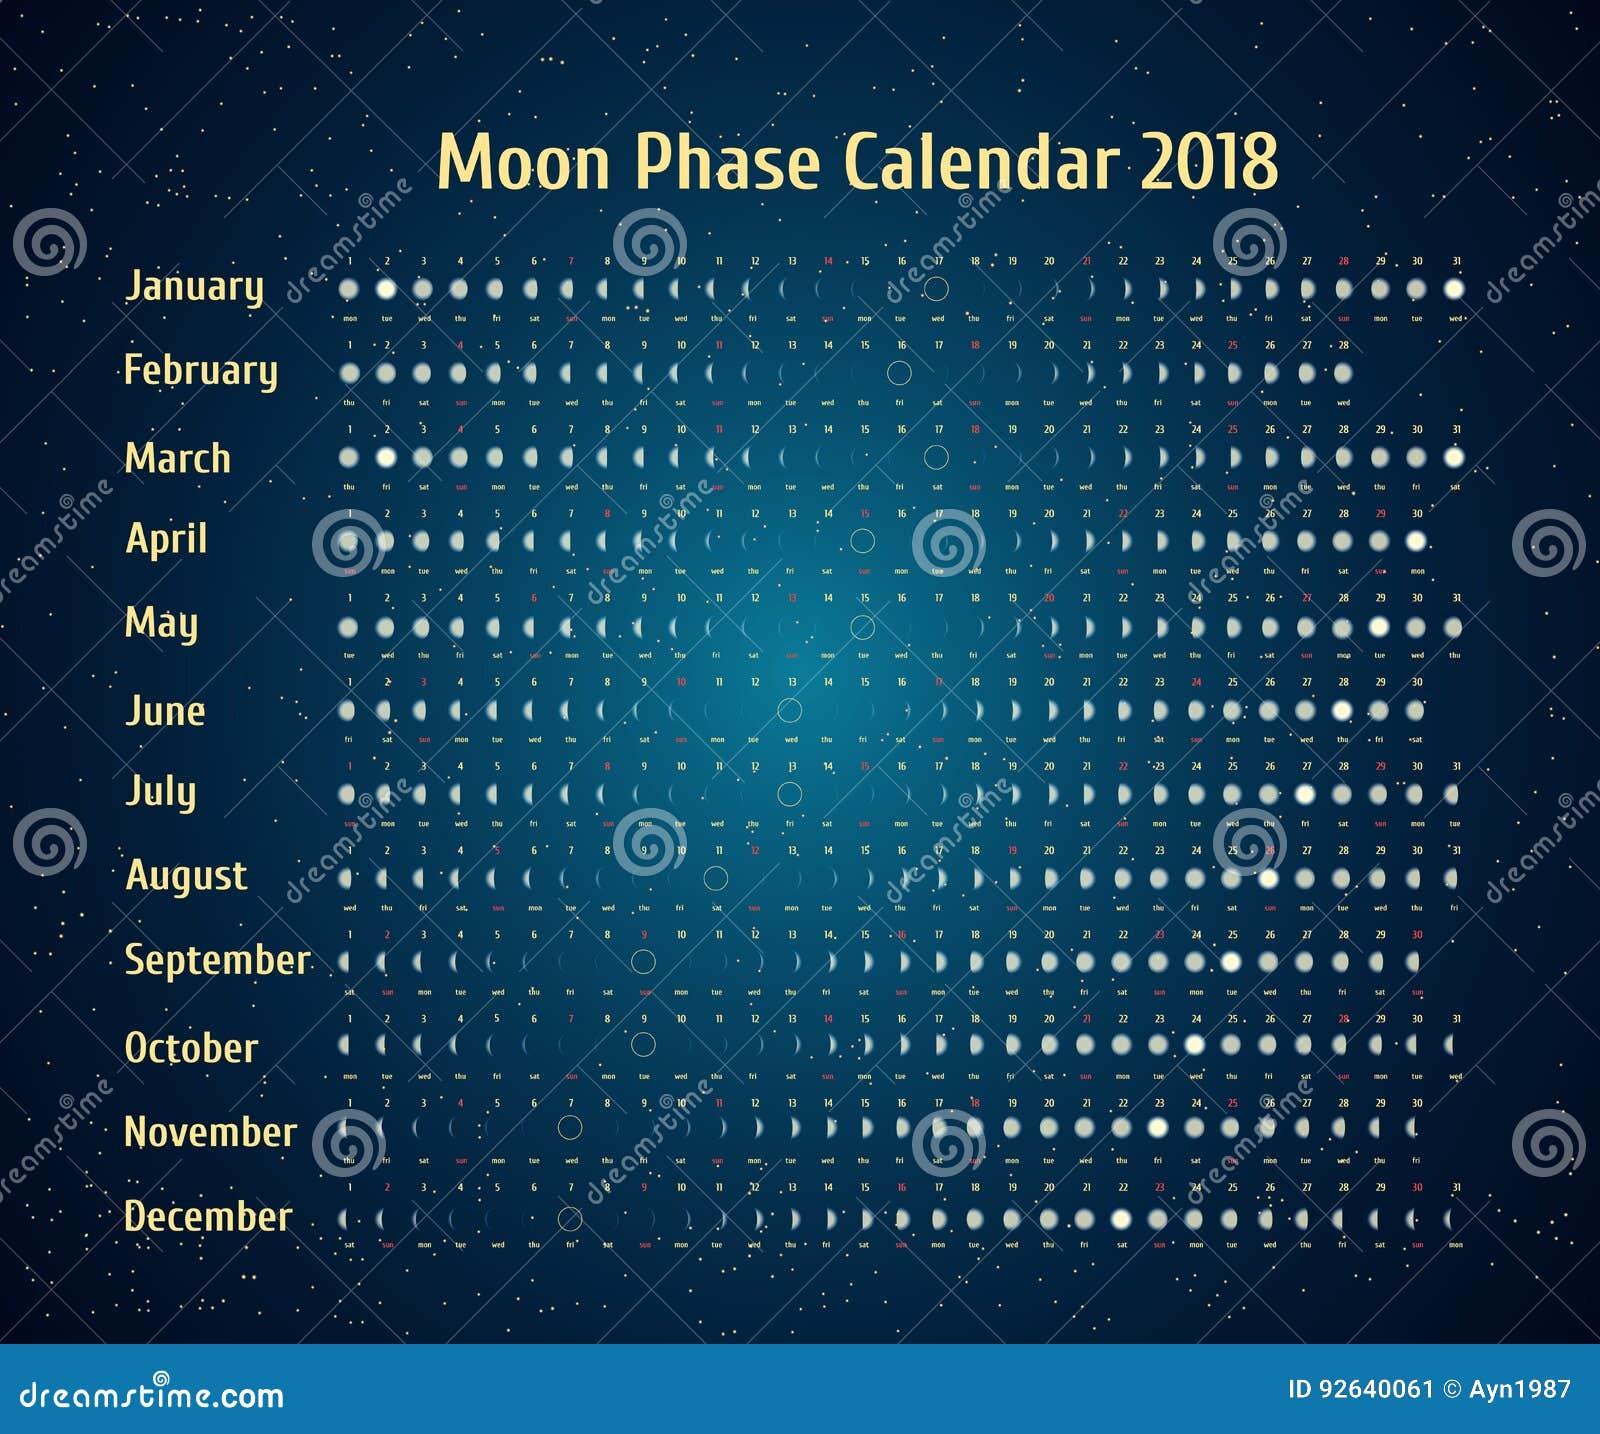 Vector Astrological Calendar For 2018. Moon Phase Calendar In The